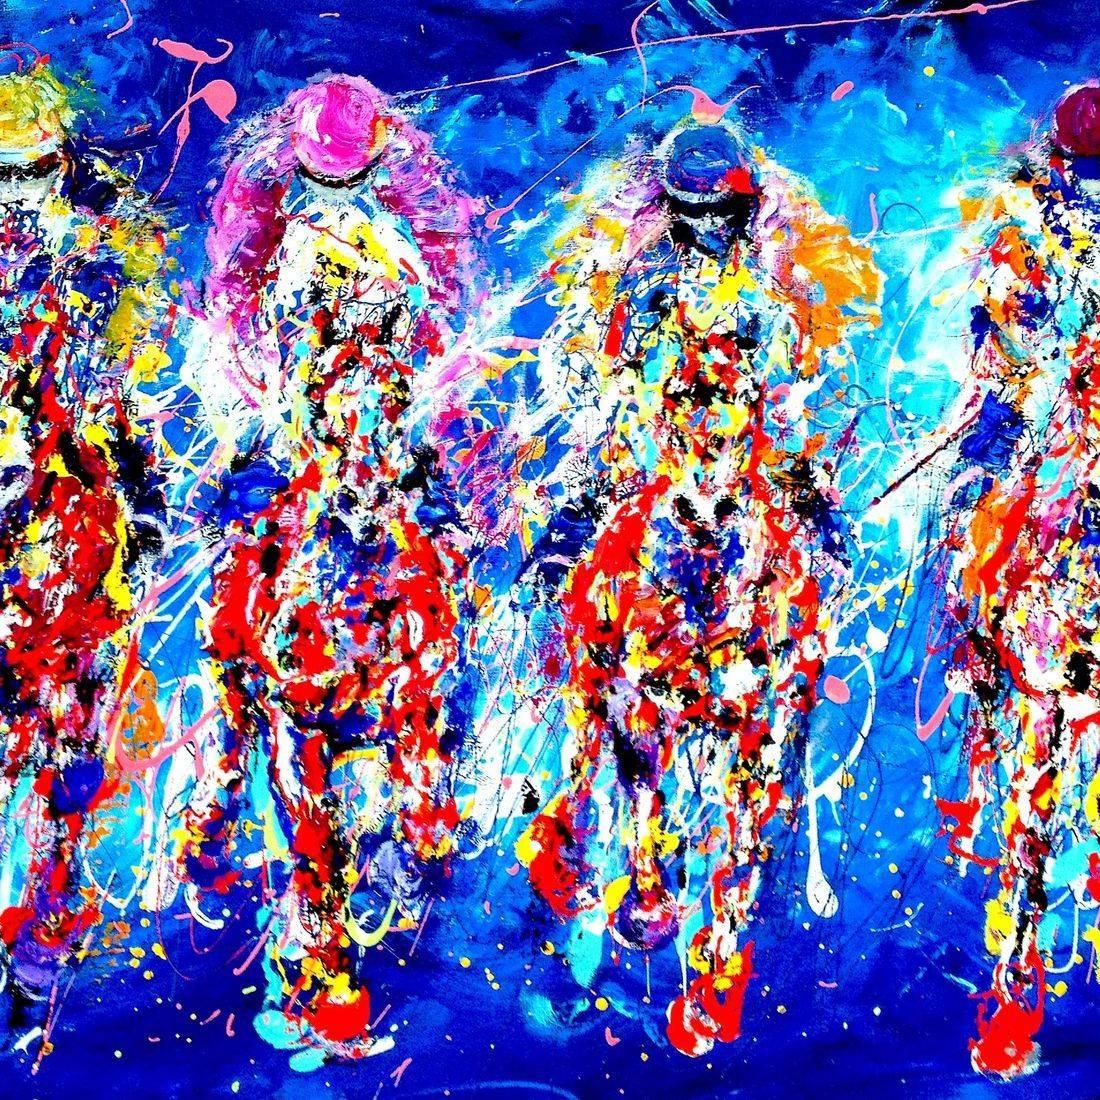 Horse racing art work by Mary Saifelden